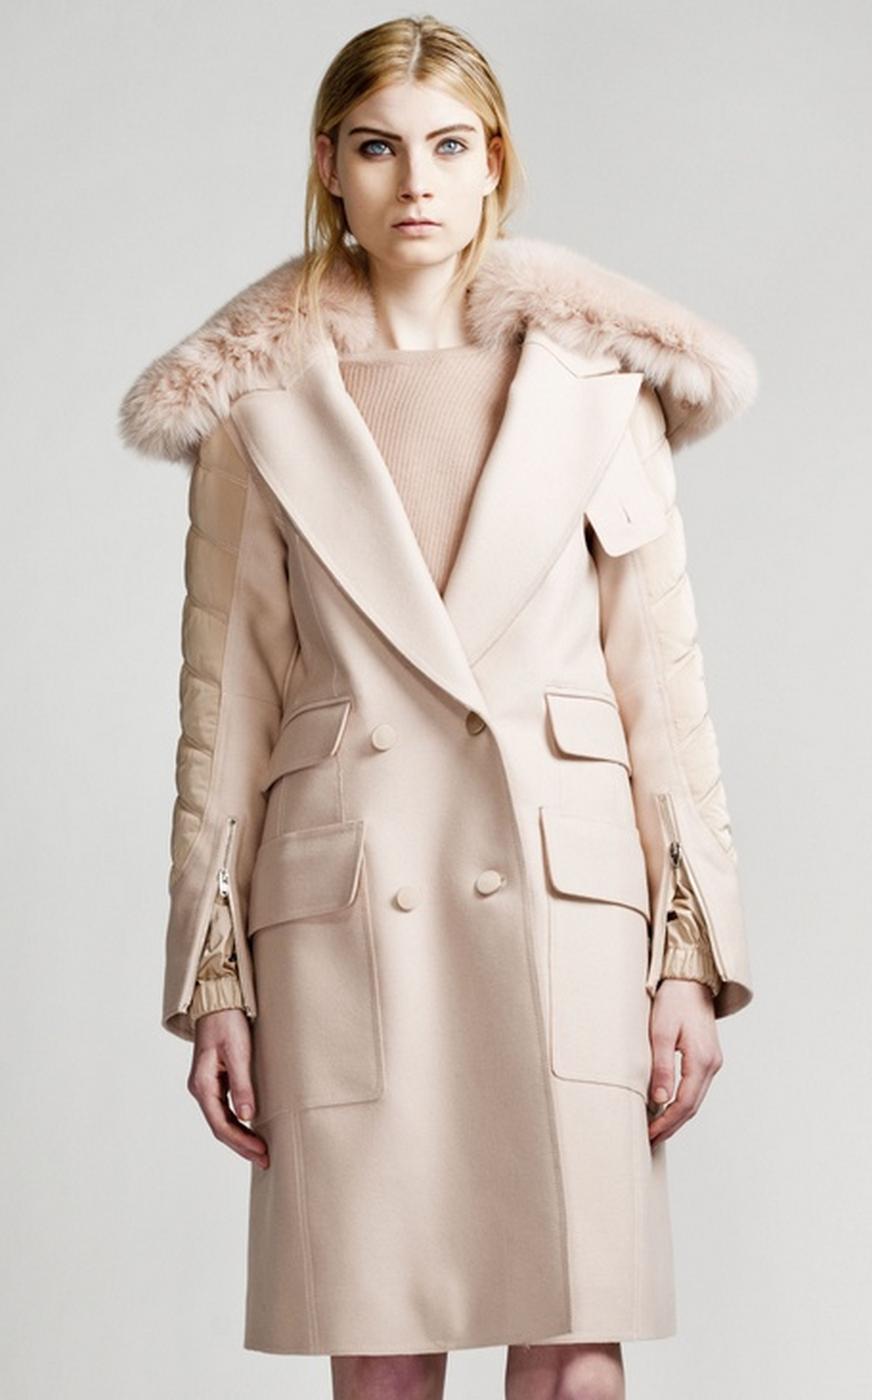 Alexander Wang - Blush Coat with Fur Trim